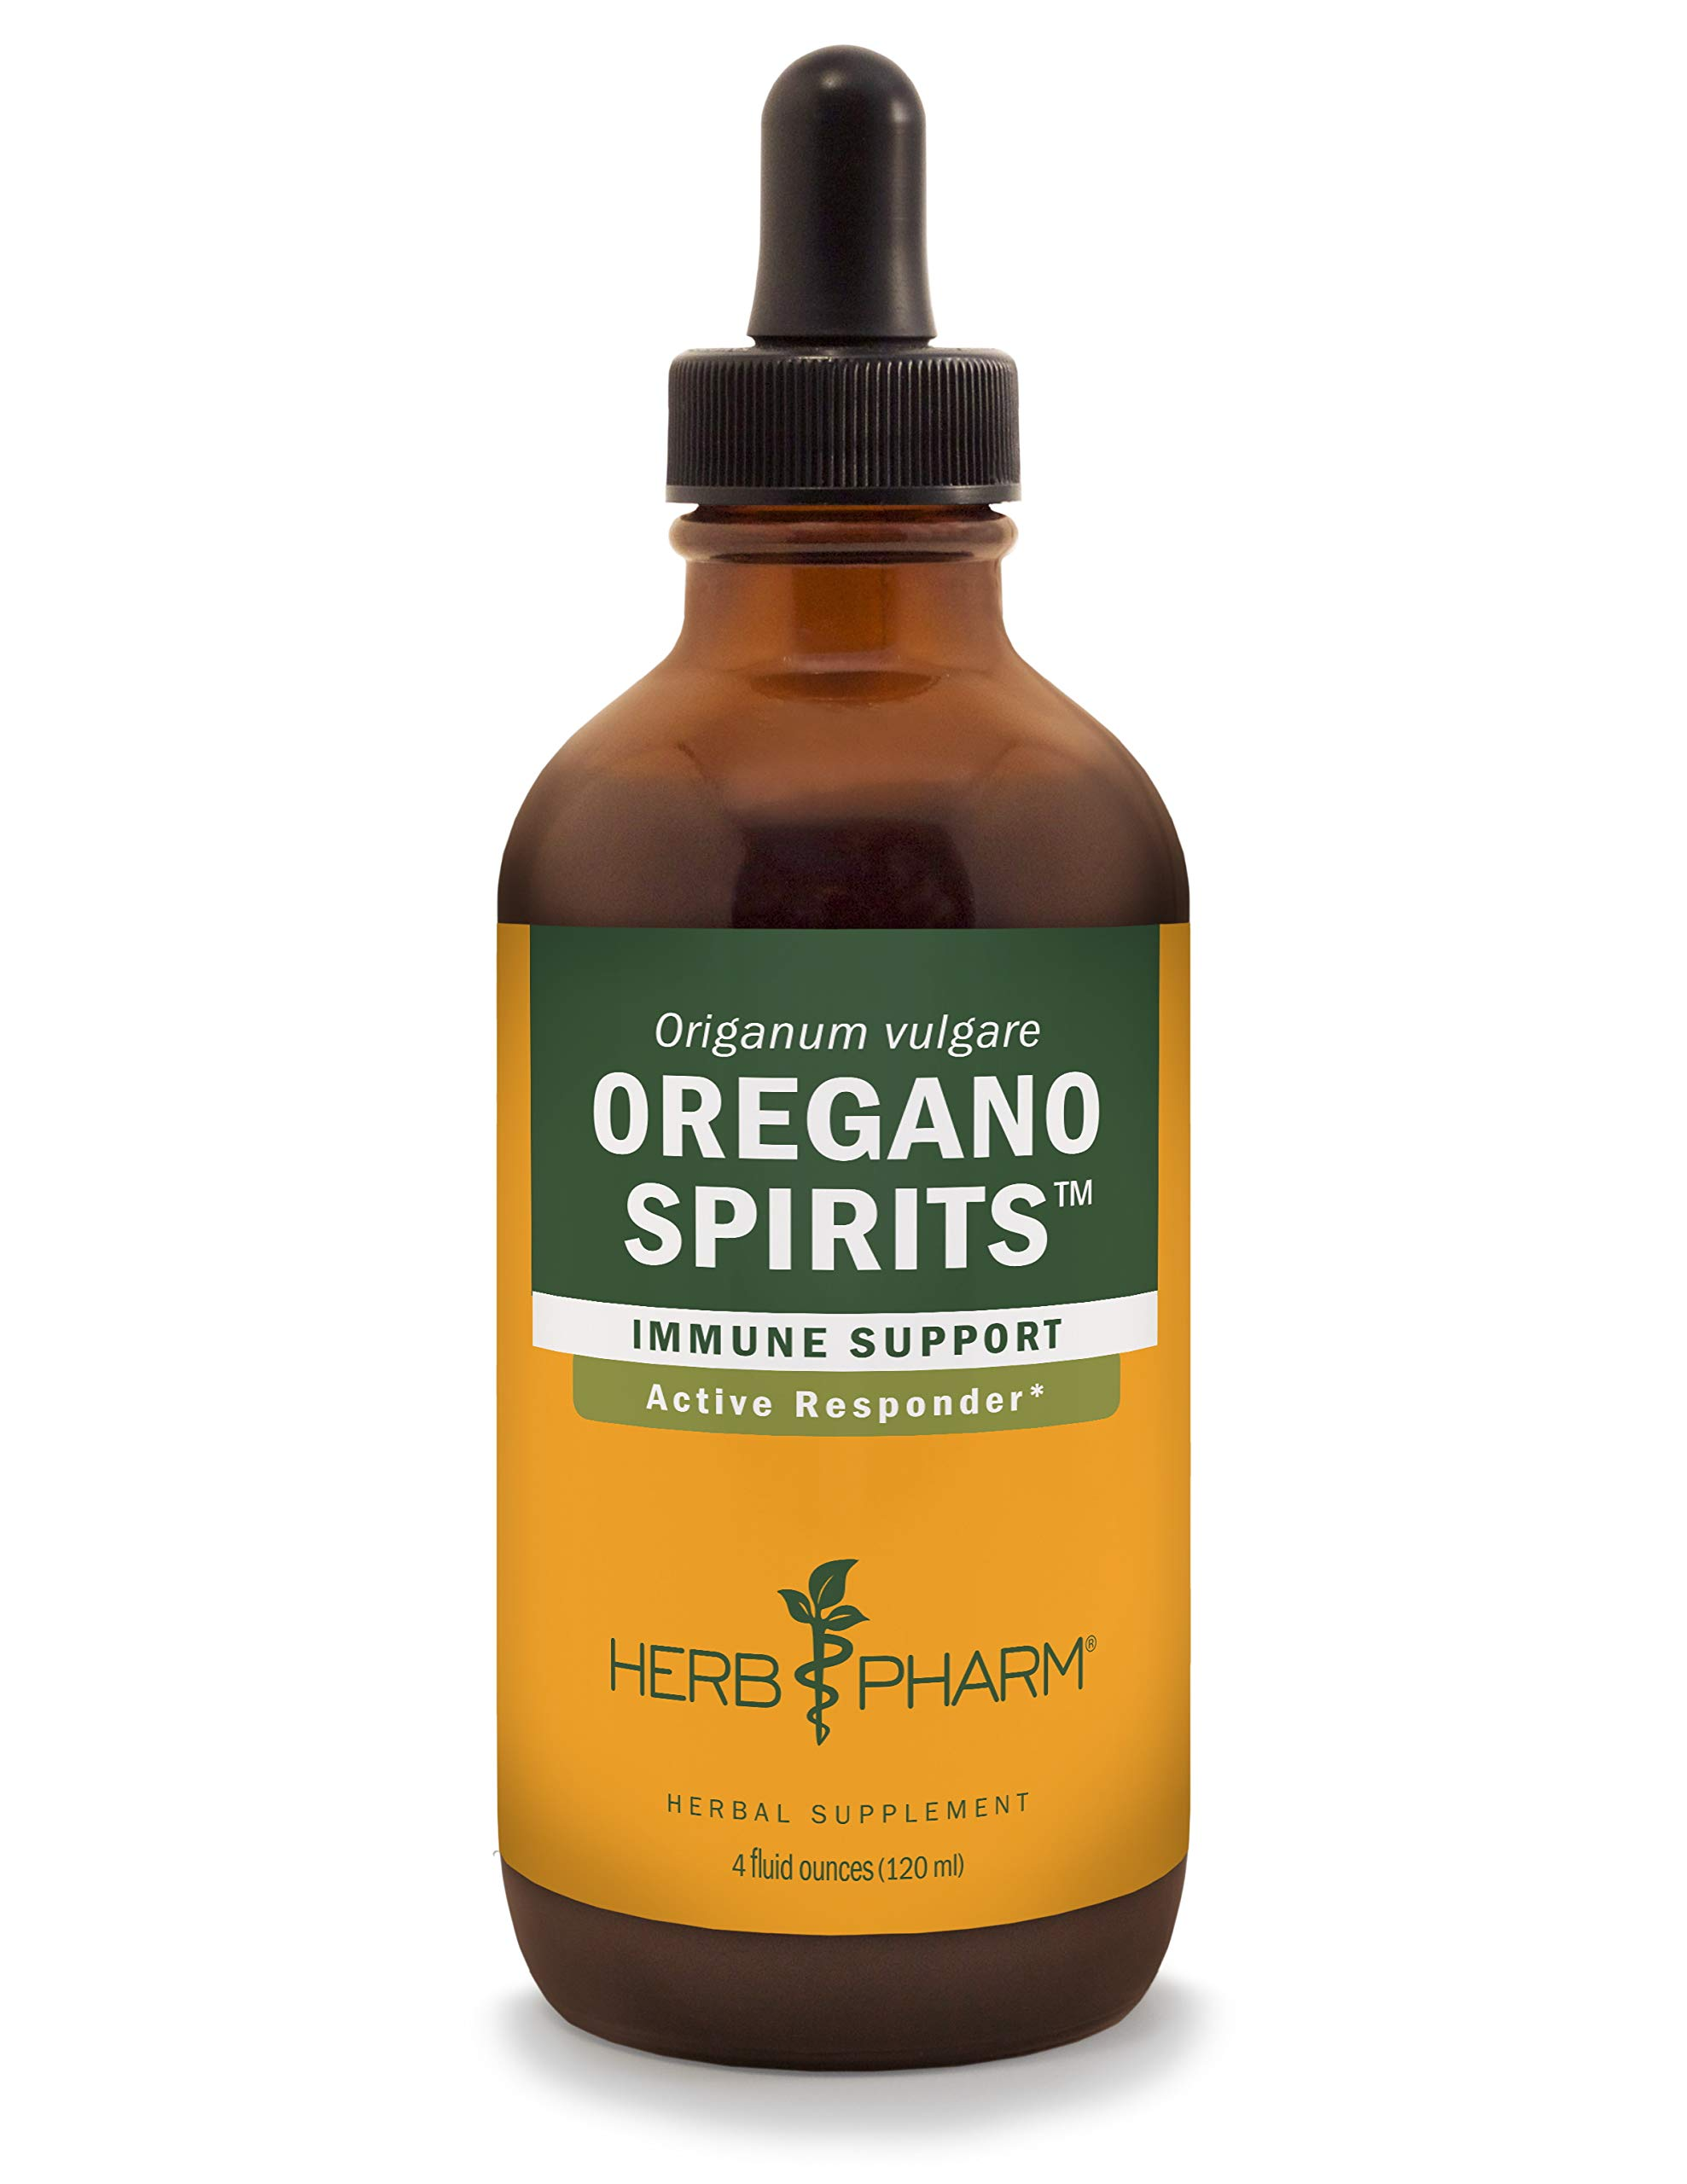 herb pharm oregano spirits review